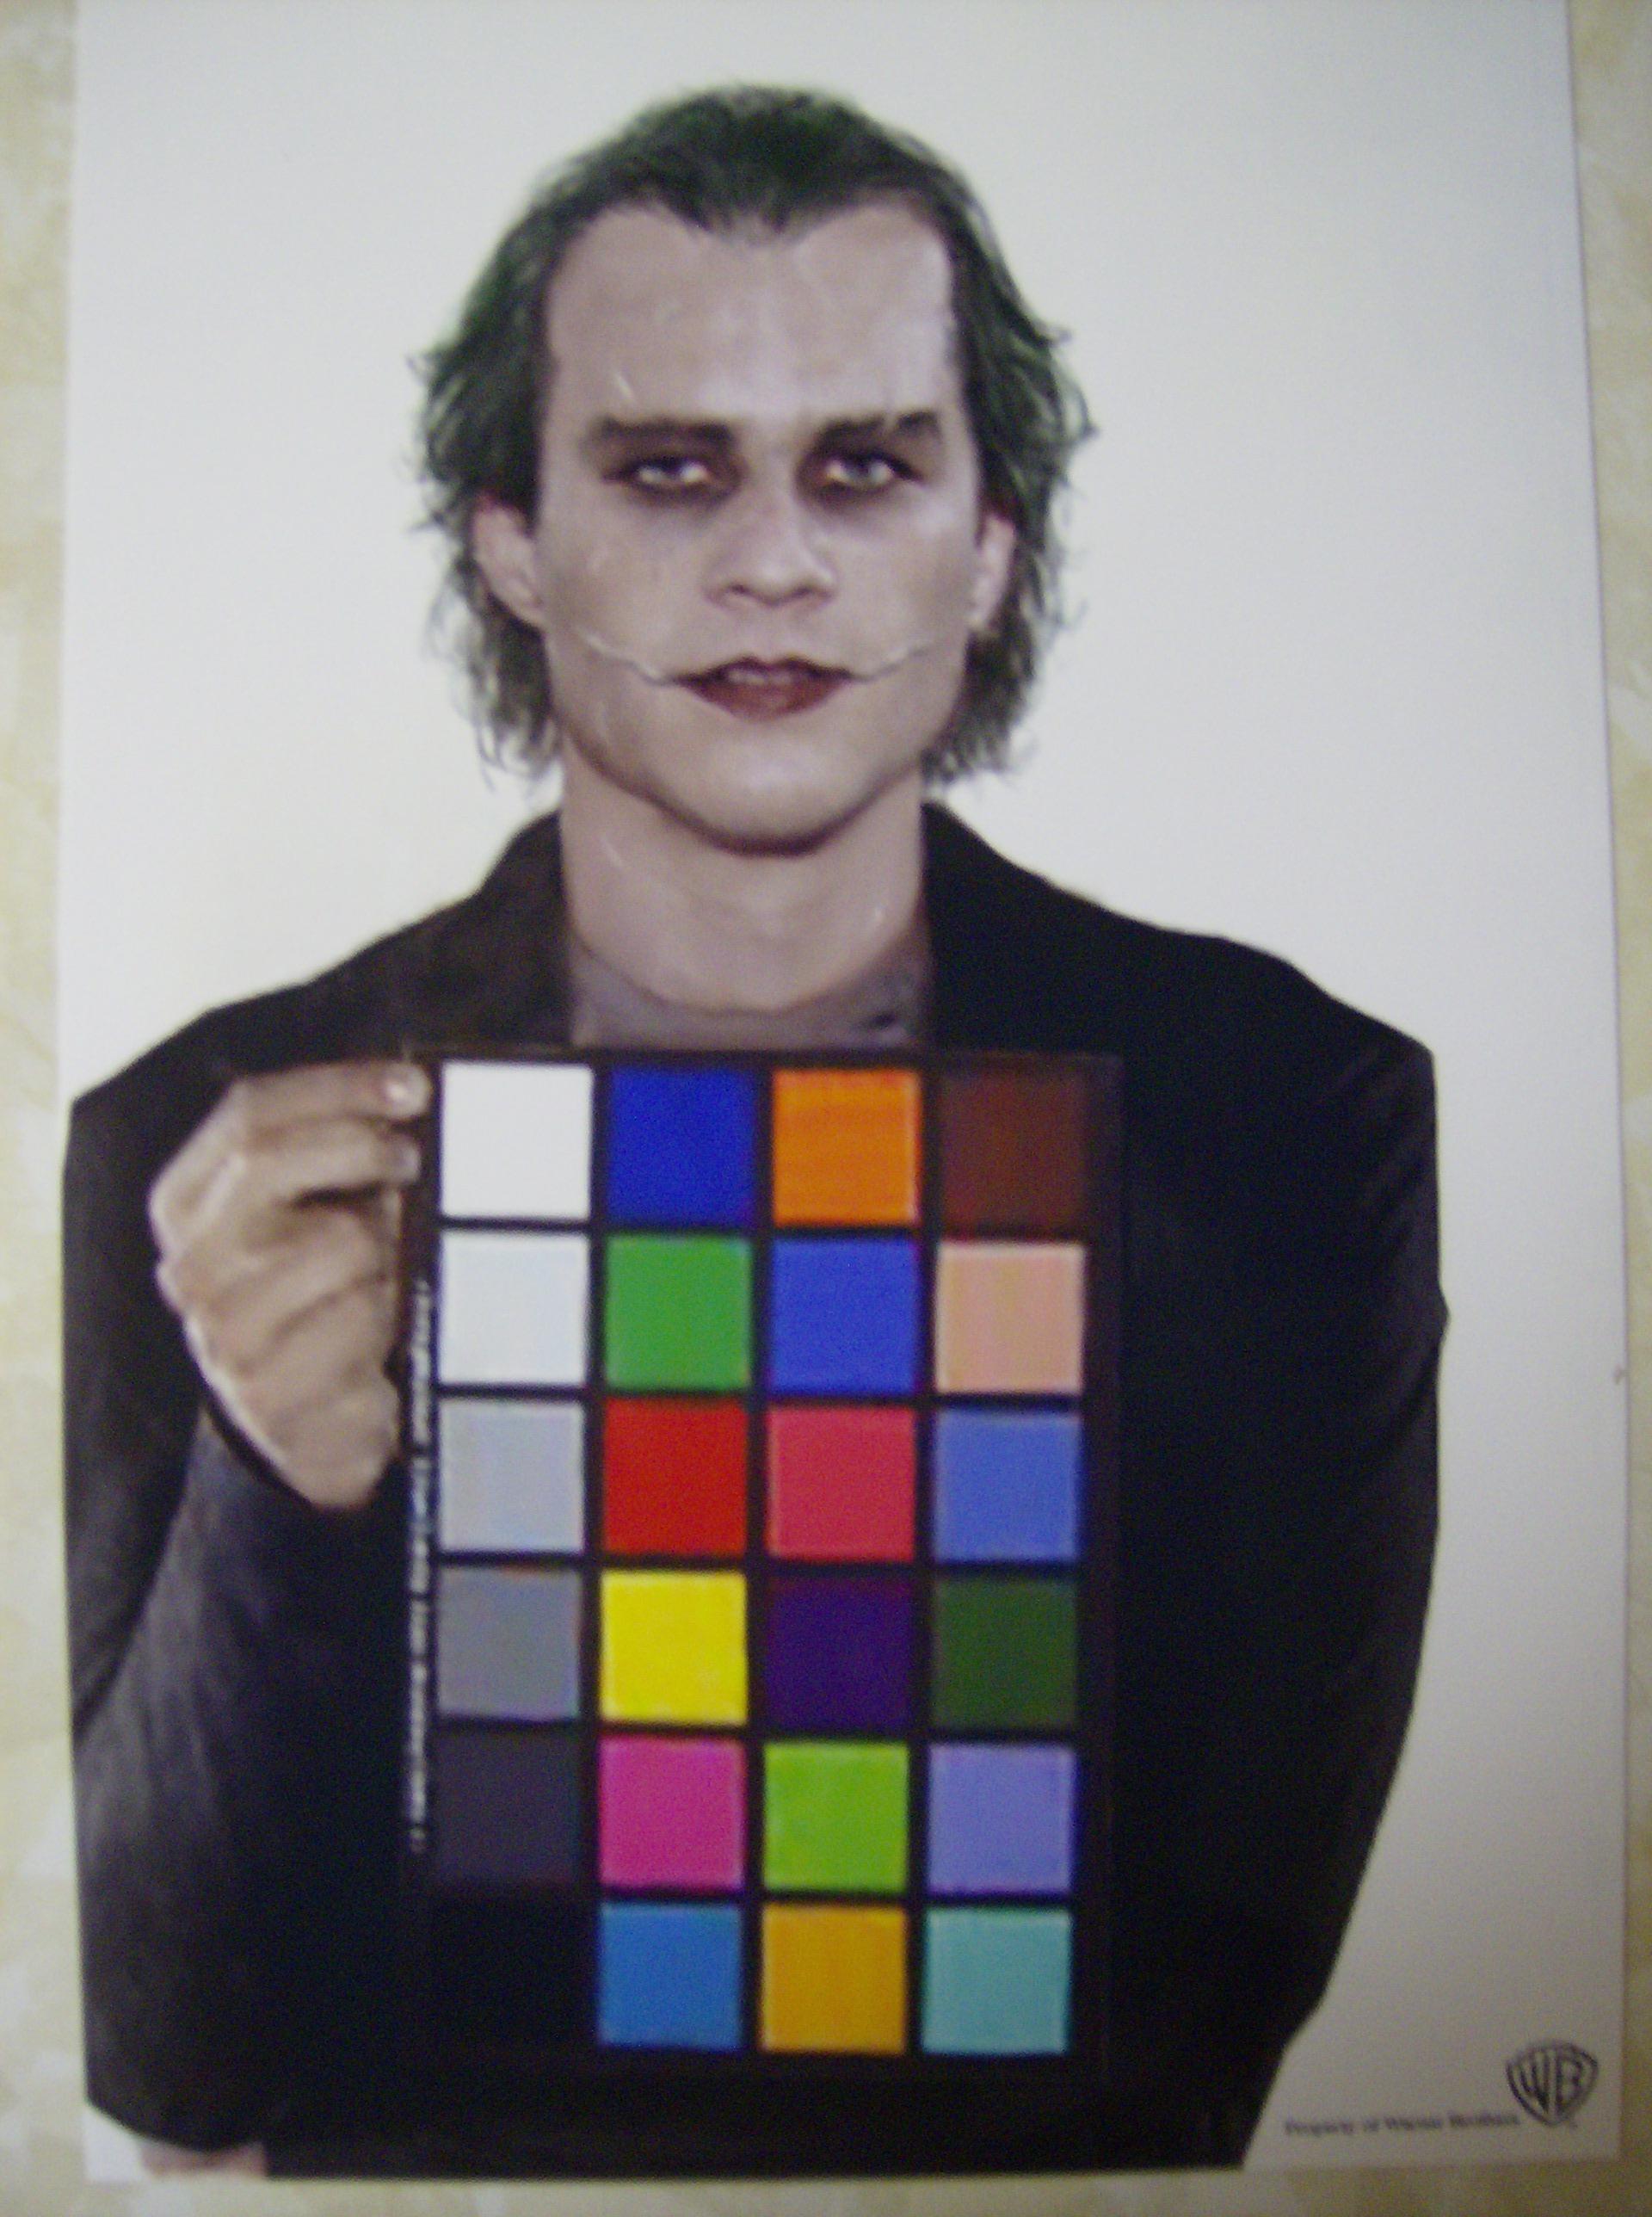 Heath Ledger Transformation Into The Joker